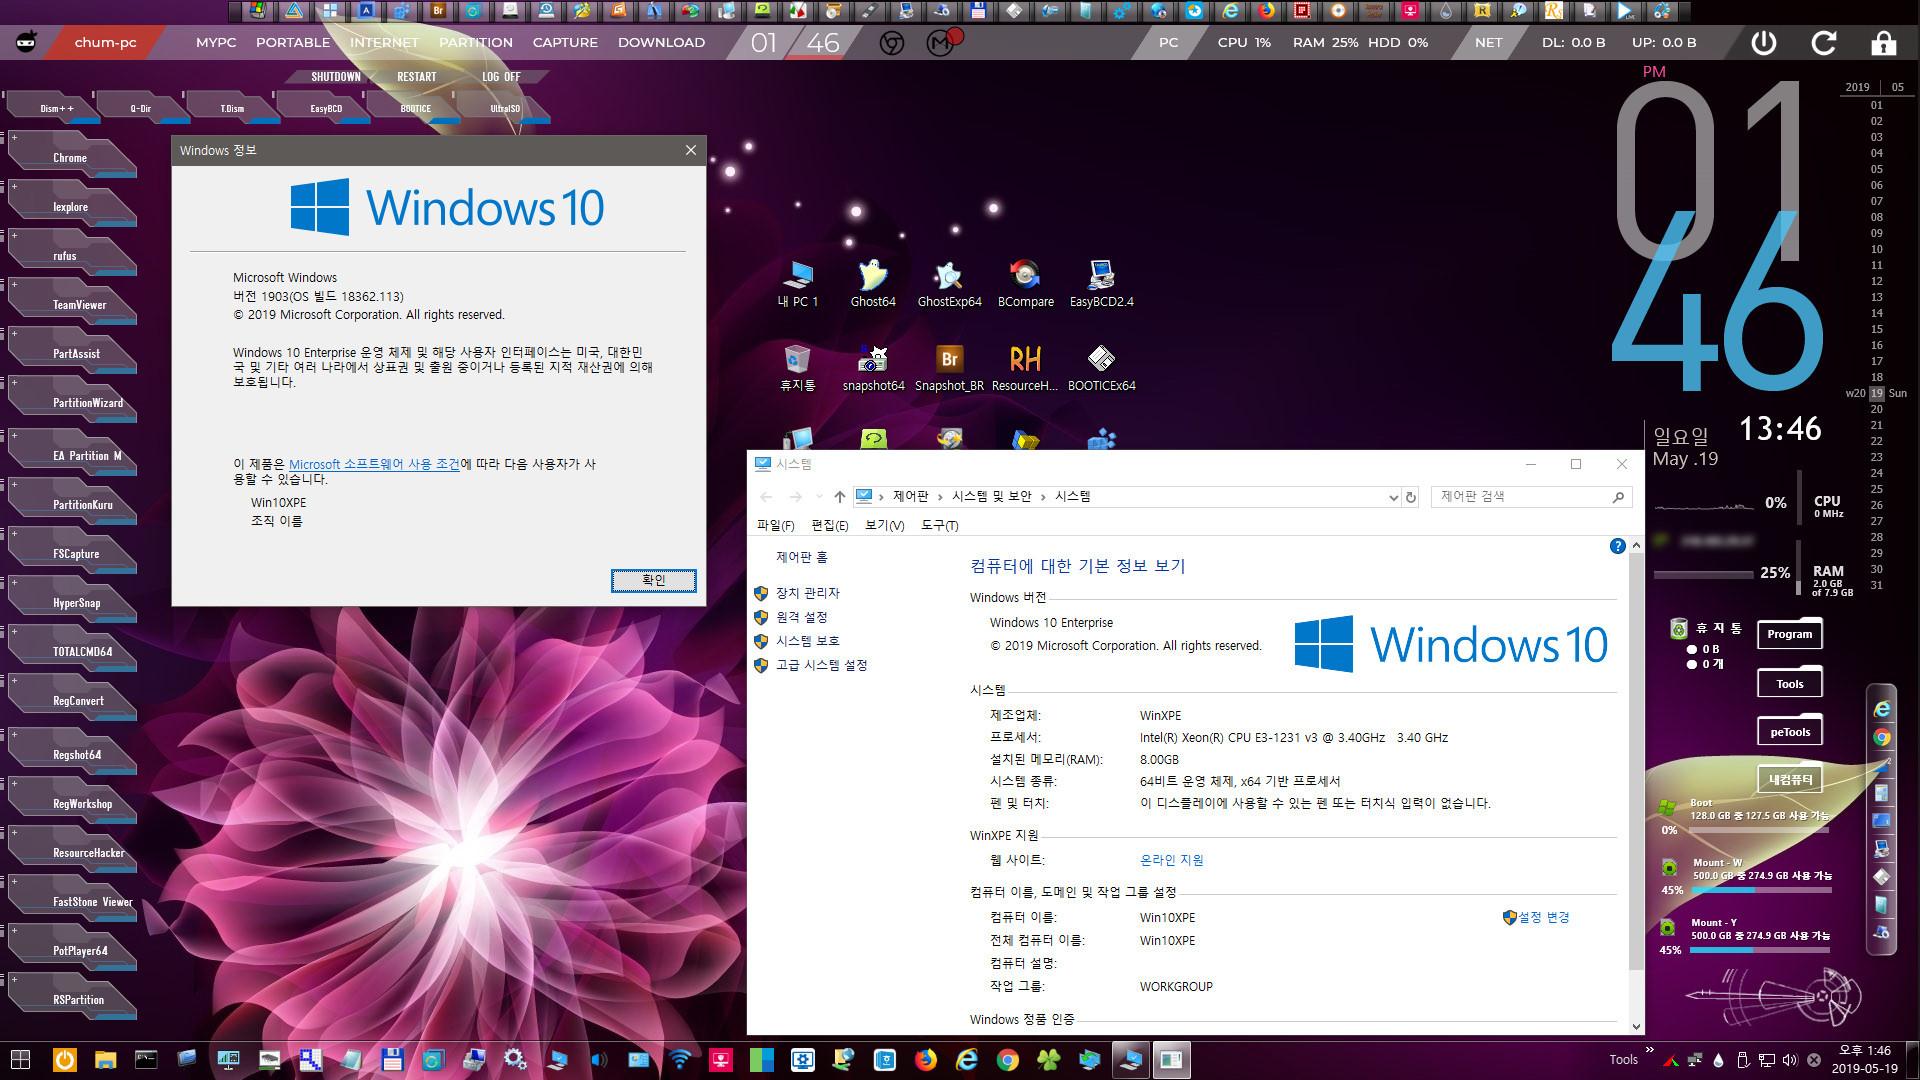 Win10XPE_x64_Chum_190518_0003-01.jpg